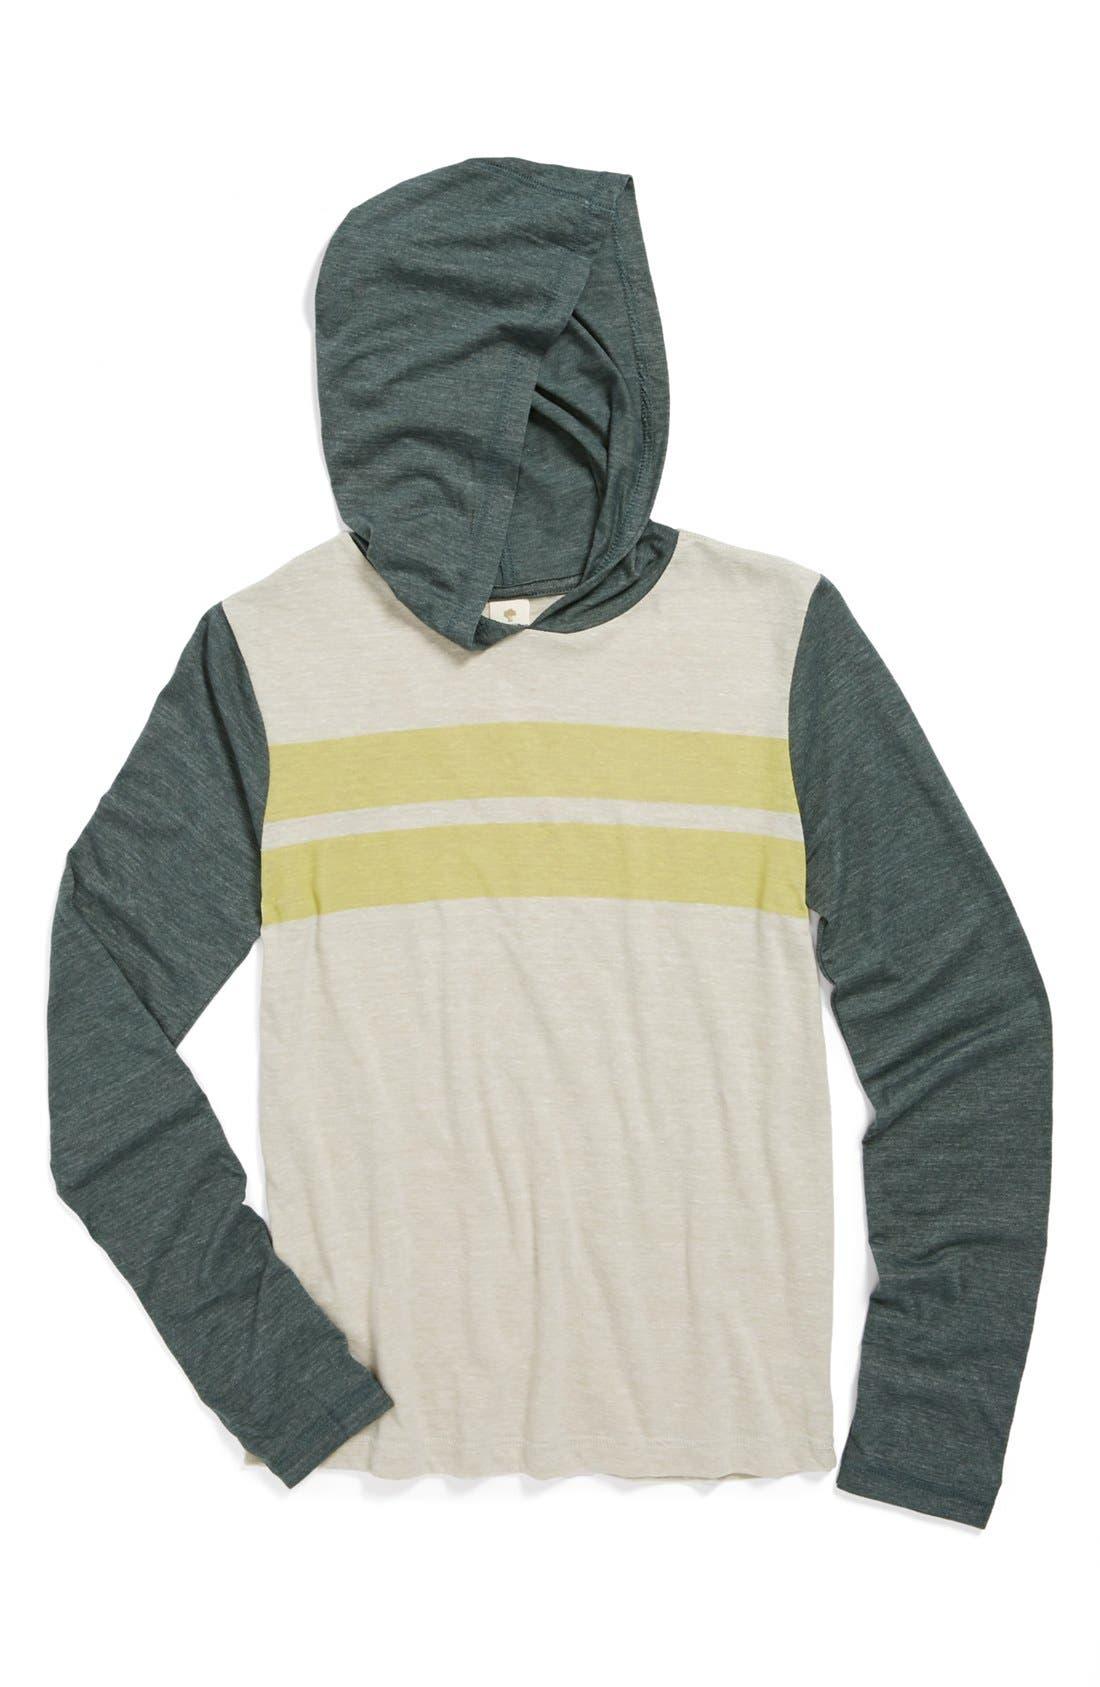 Main Image - Tucker + Tate 'Halsten' Hooded T-Shirt (Big Boys)